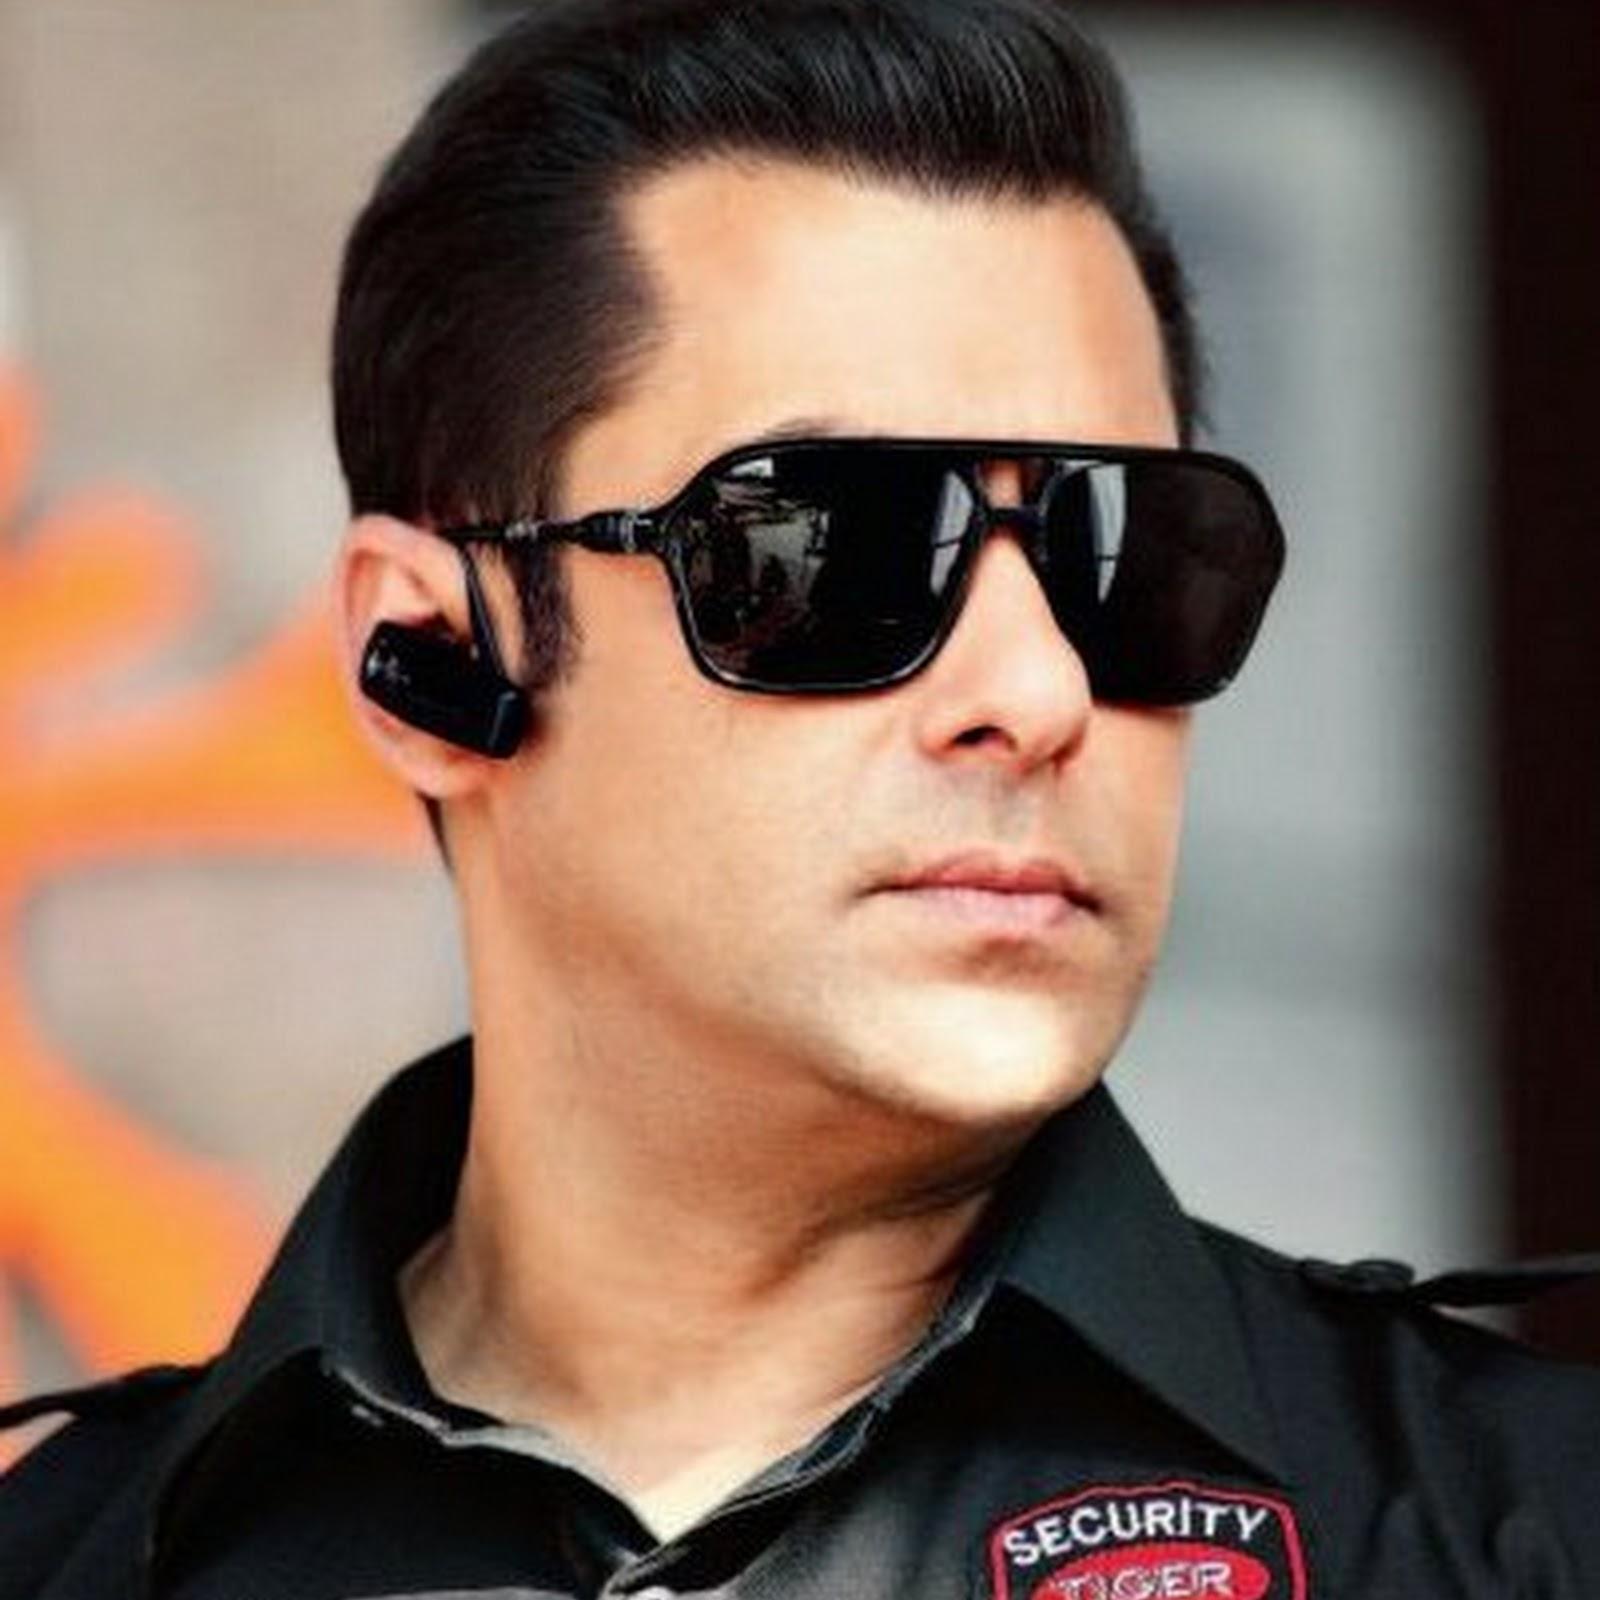 Salman khan songs download: salman khan hit mp3 new songs online.